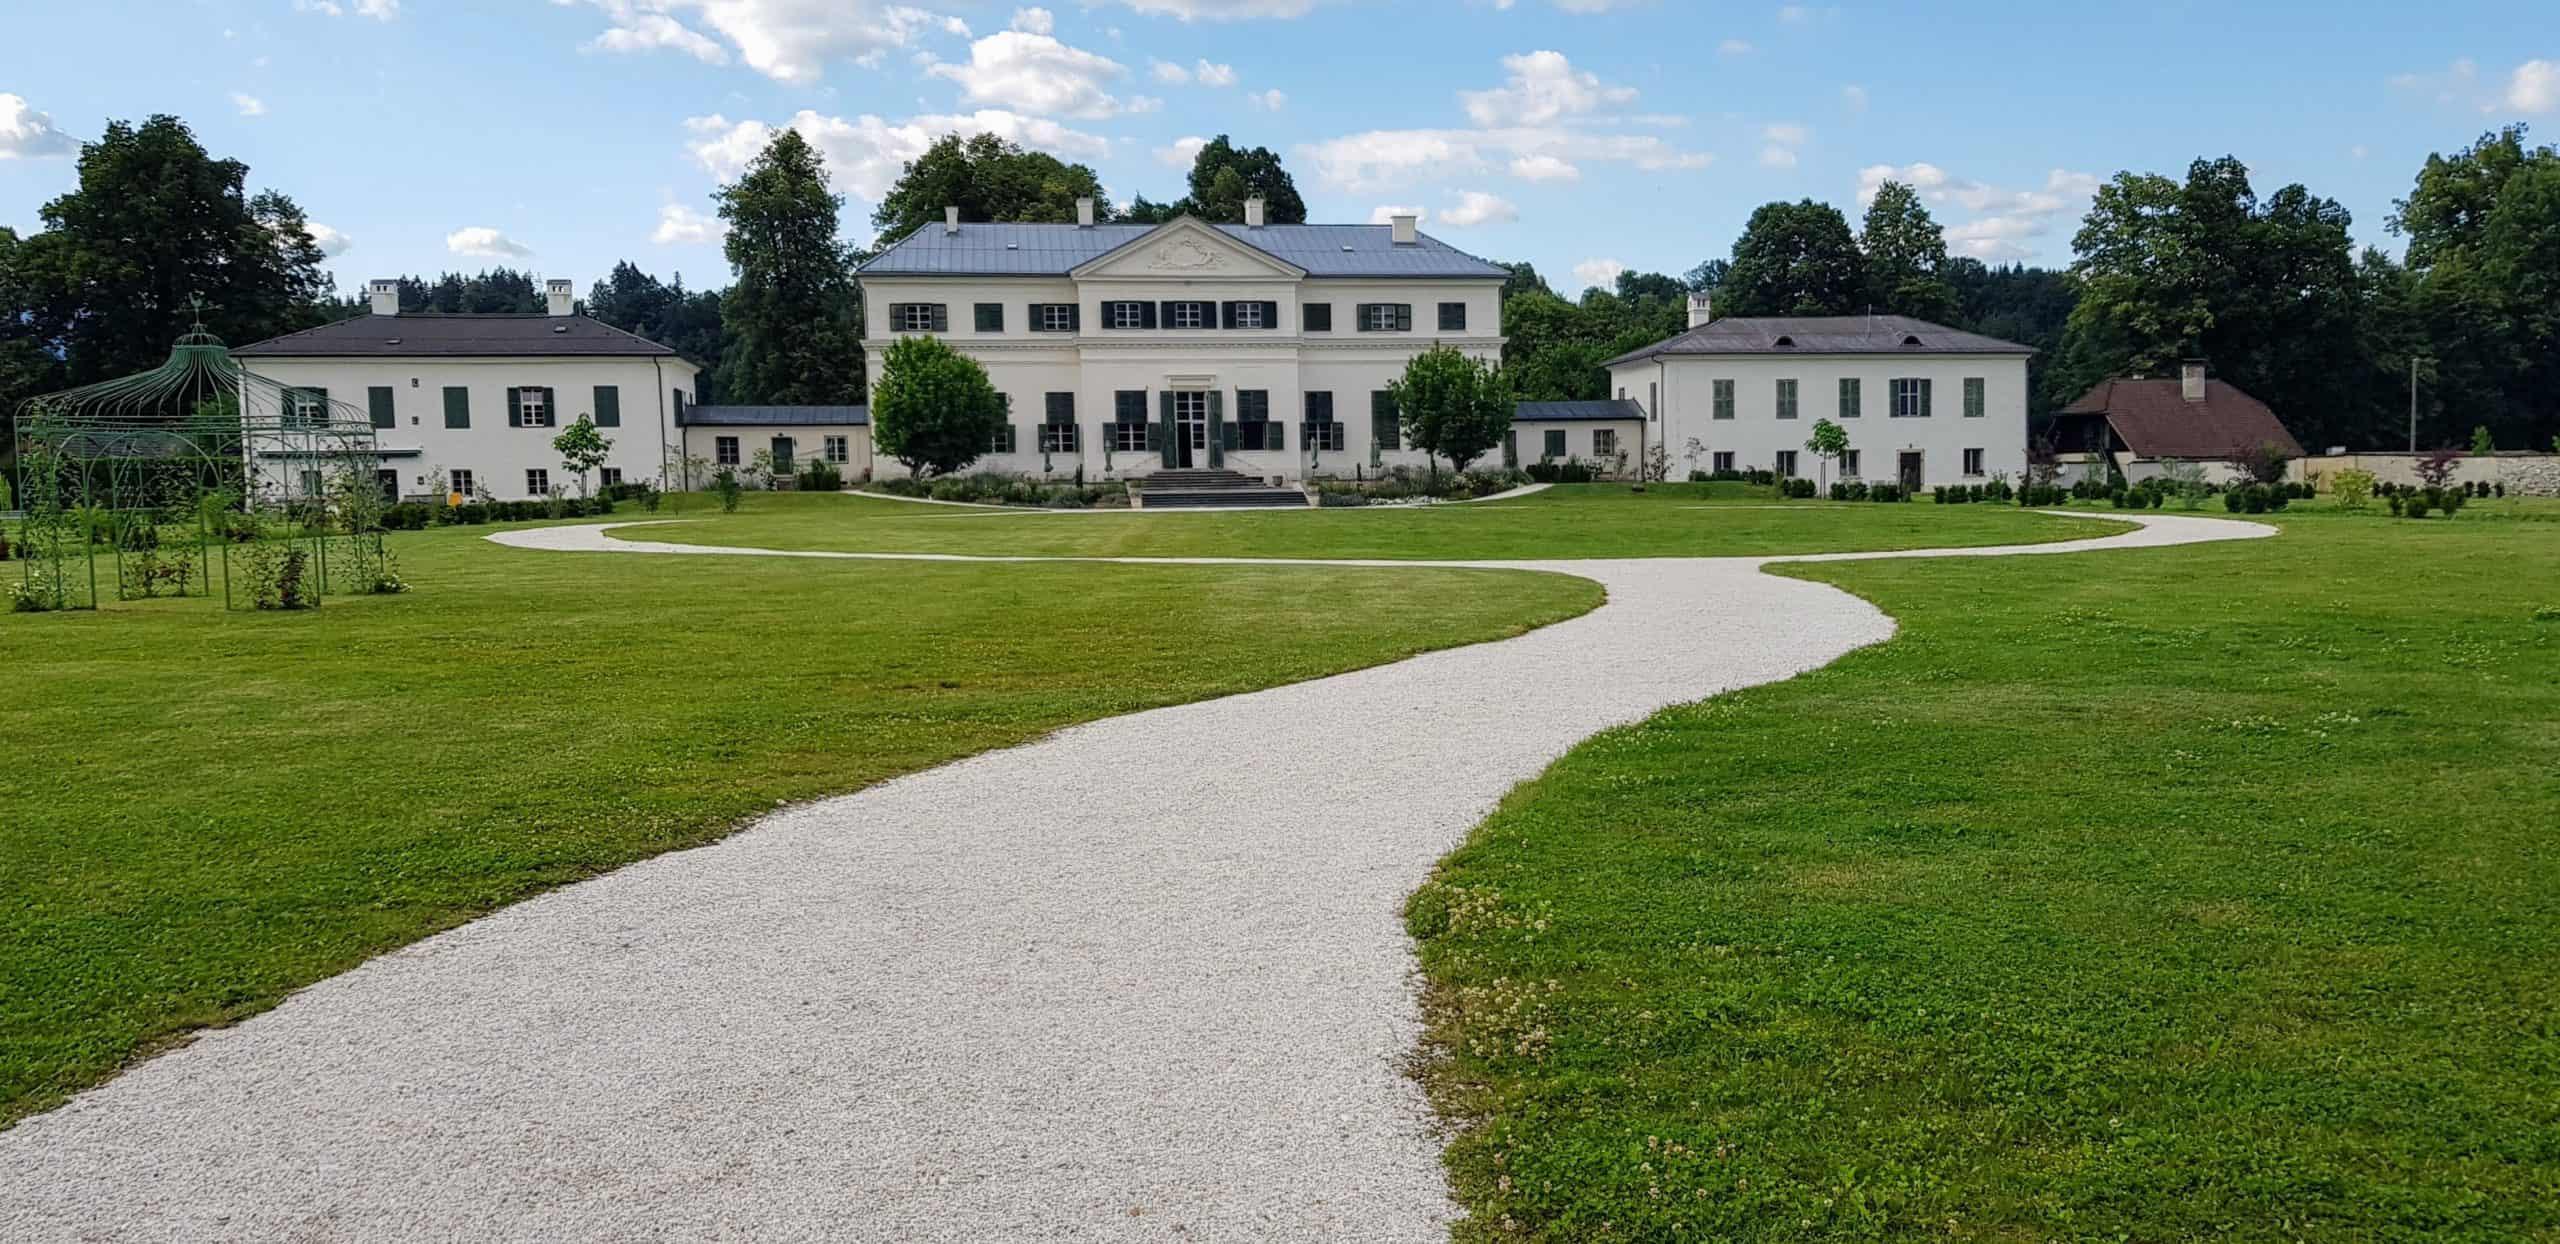 Schloss Rosegg Nähe Wörthersee im Mai geöffnet